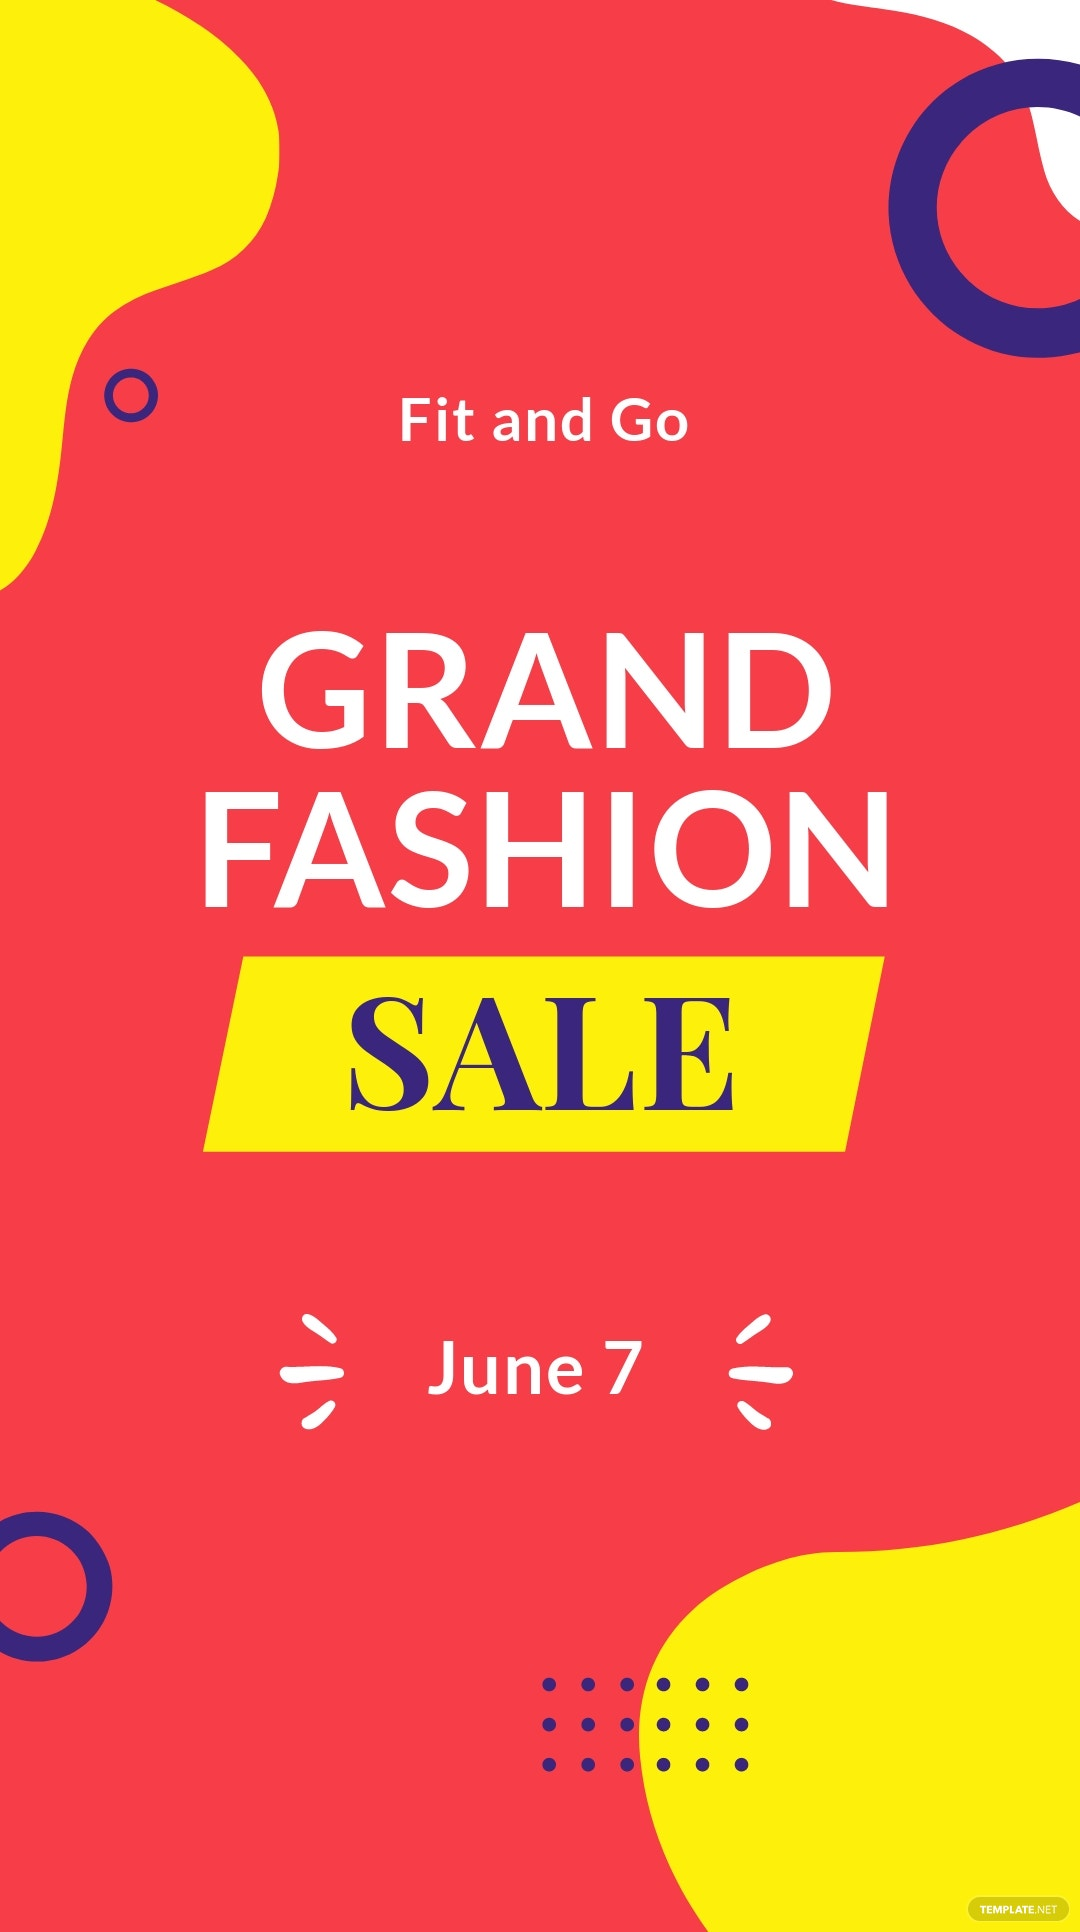 Free Grand Fashion Sale Whatsapp Post Template.jpe